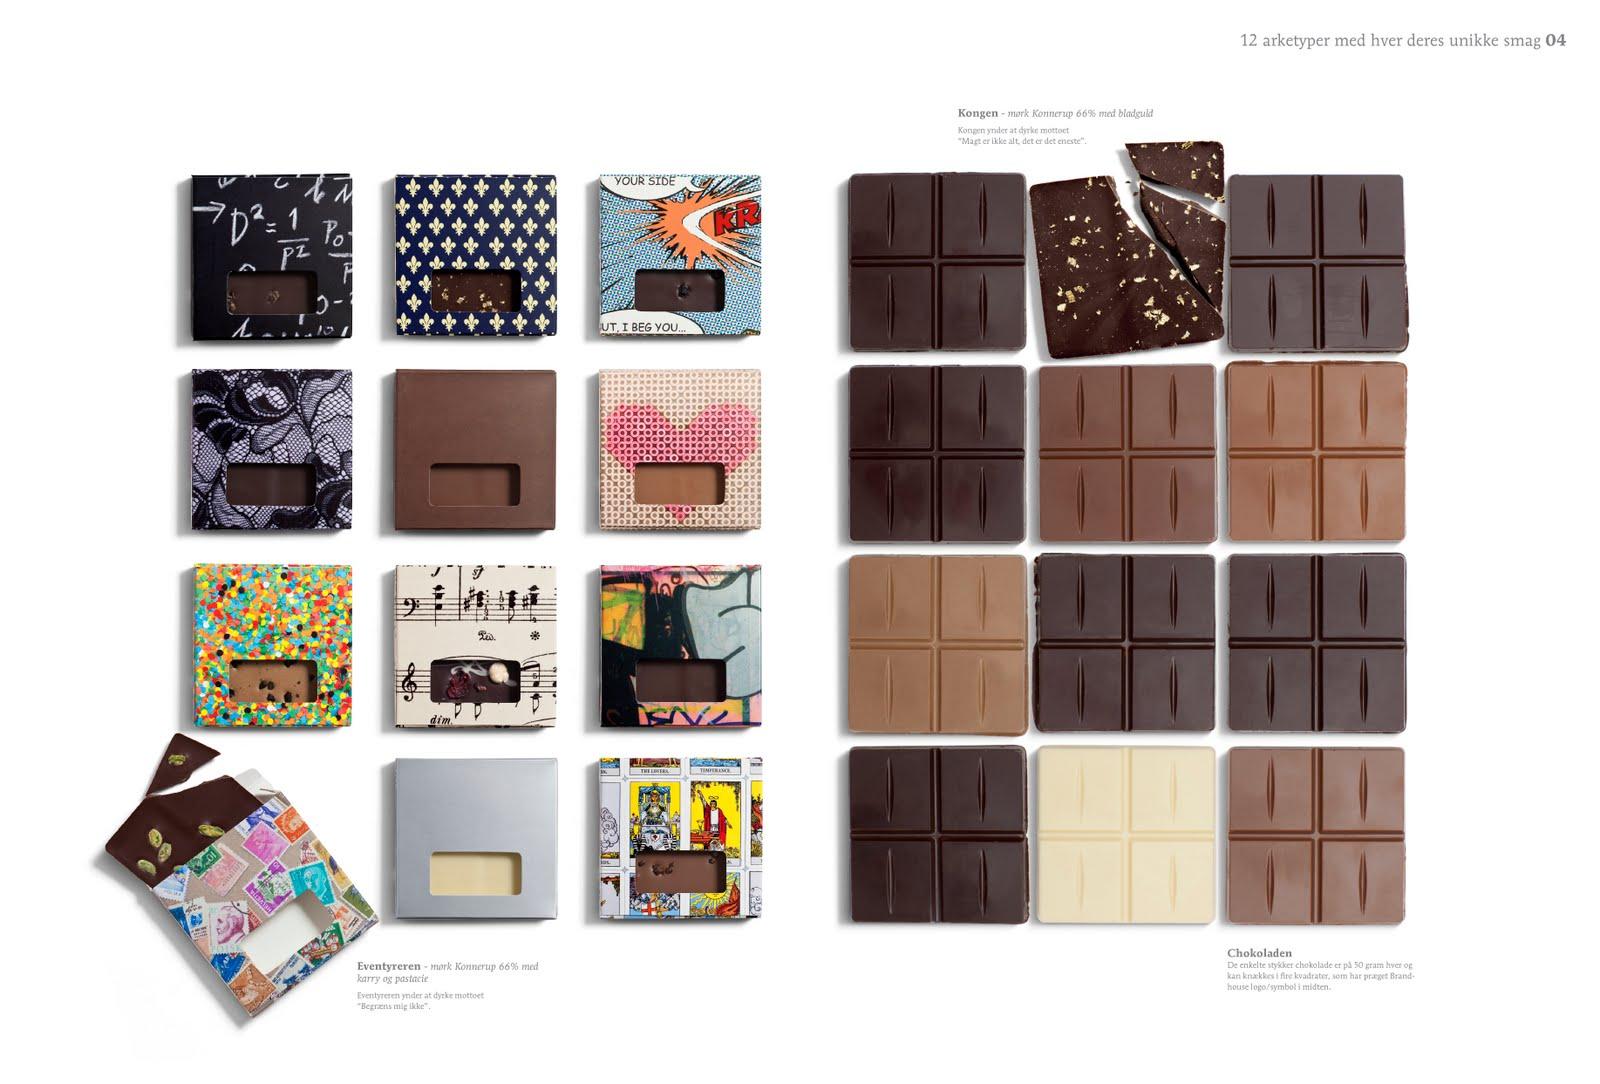 Шоколад с рисунками своими руками